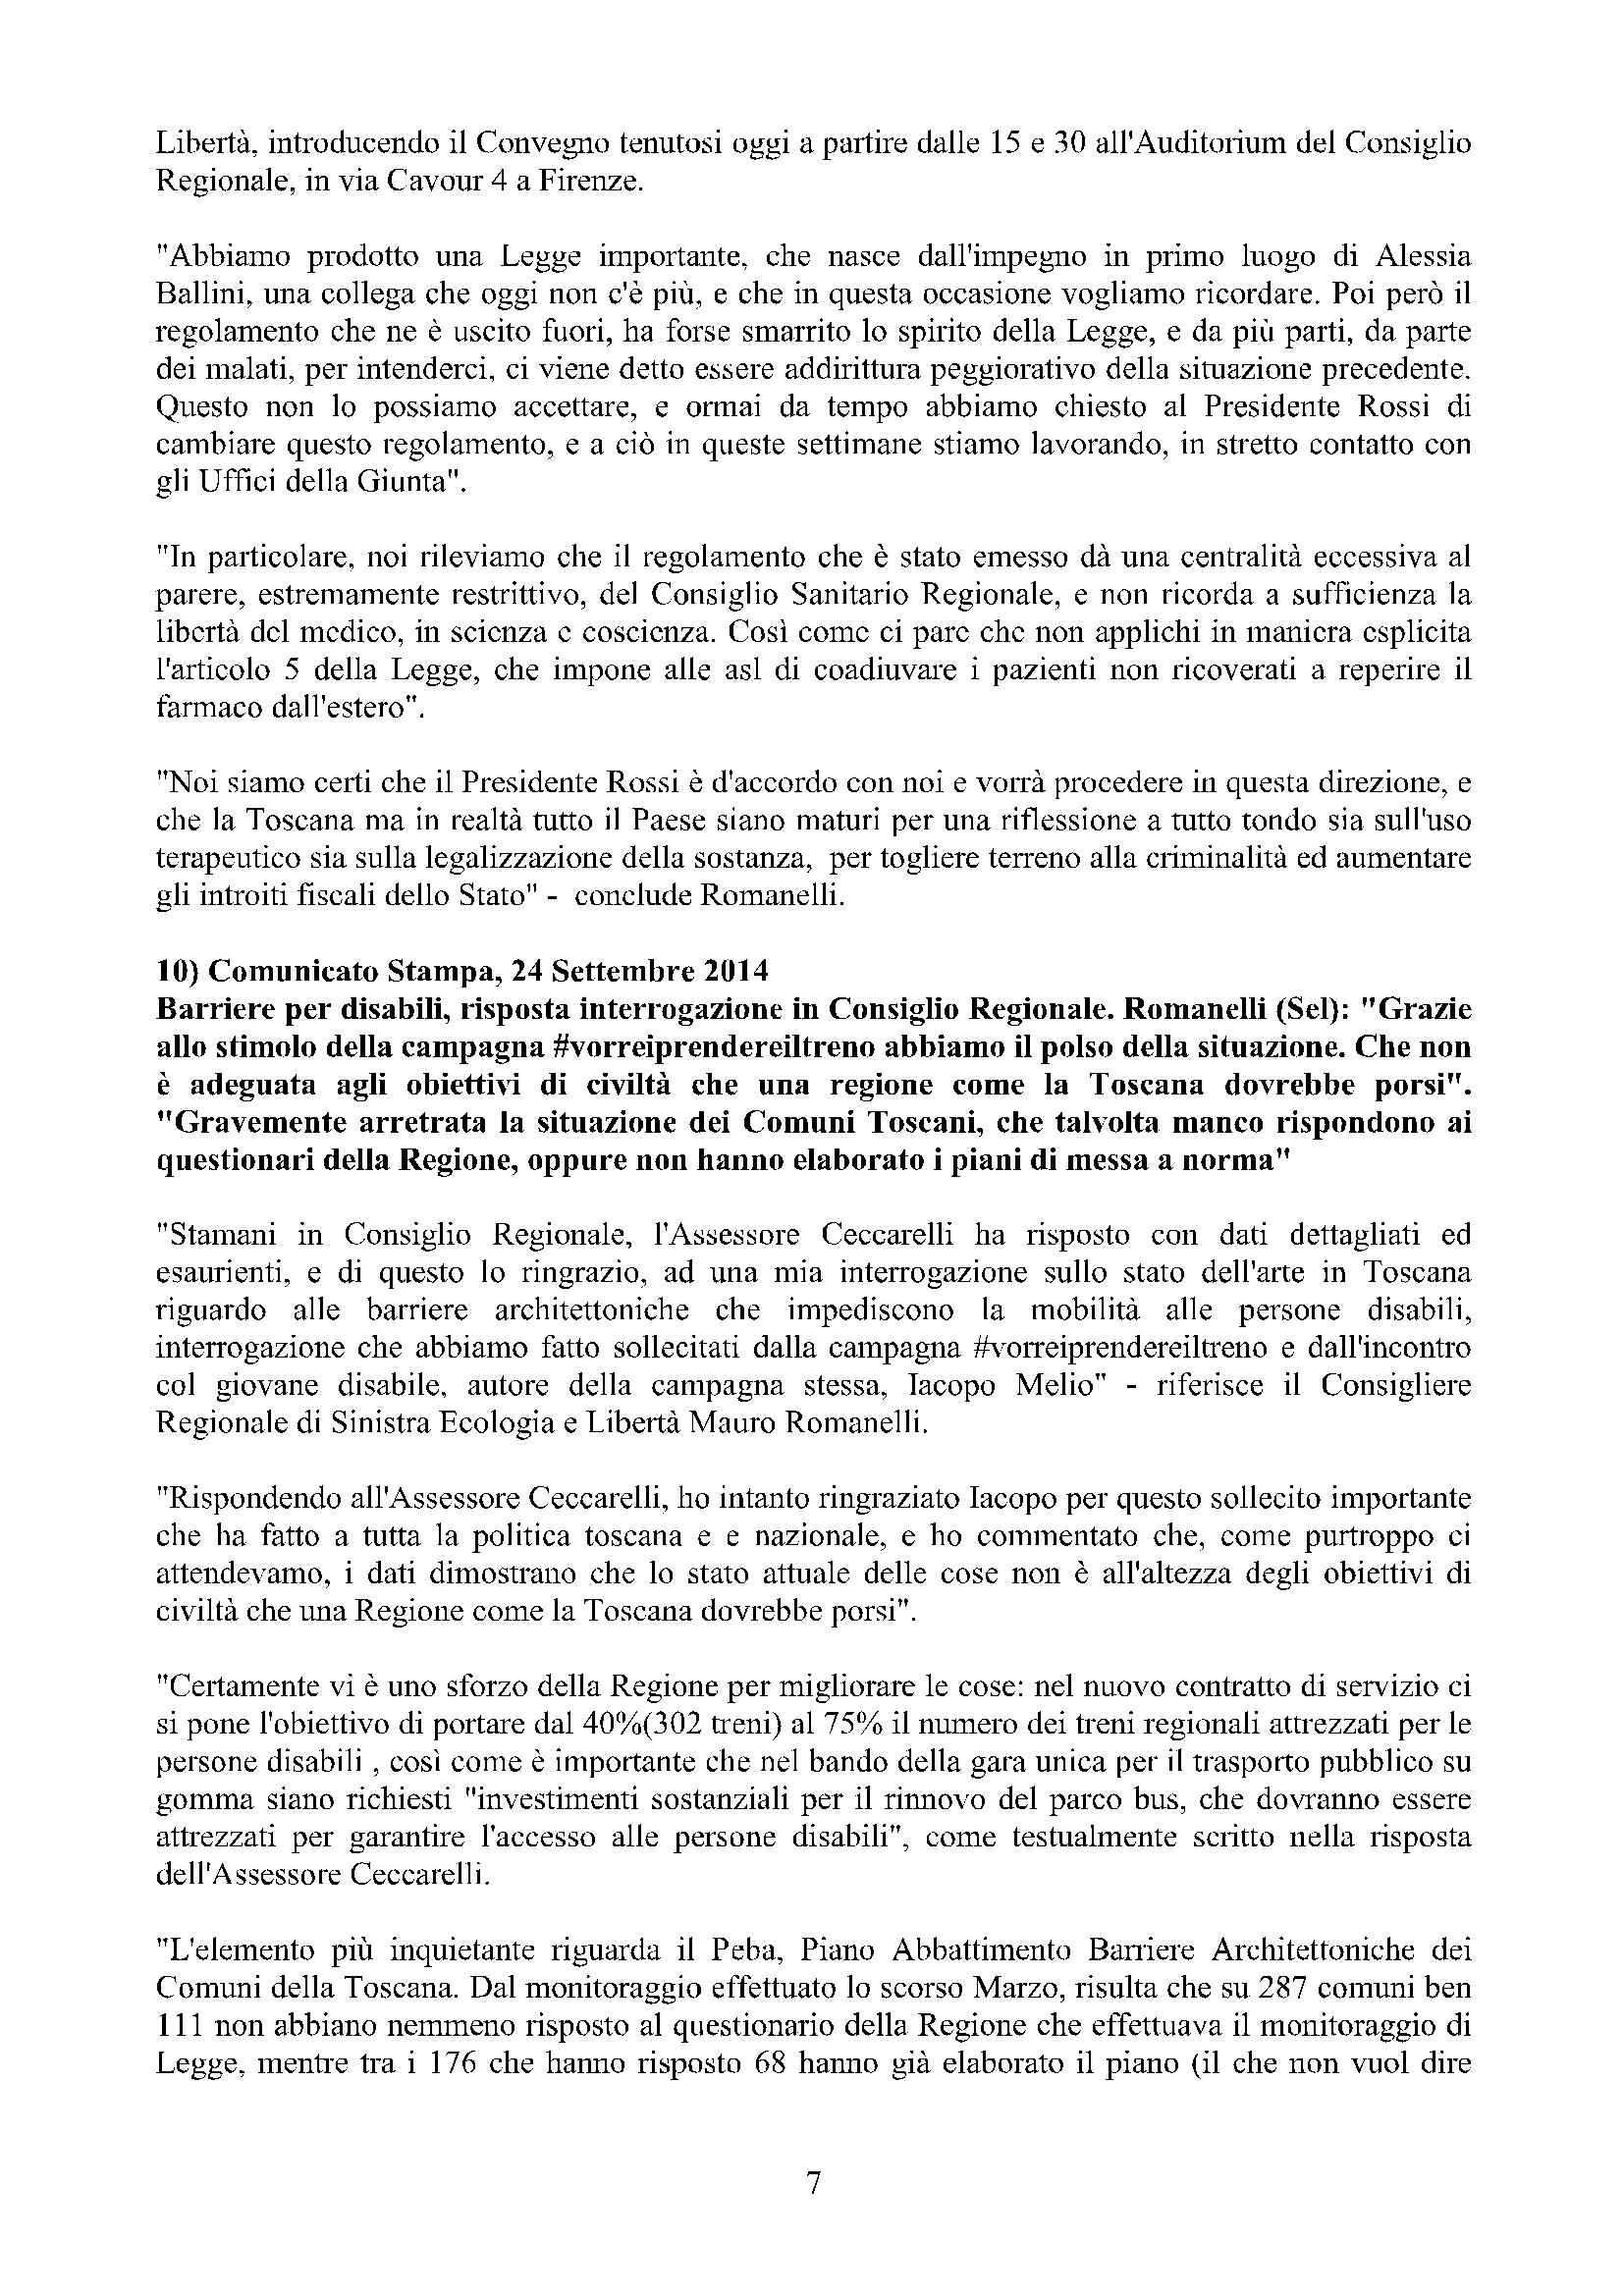 Newsletter di MAURO ROMANELLI Ottobre 2014 -7